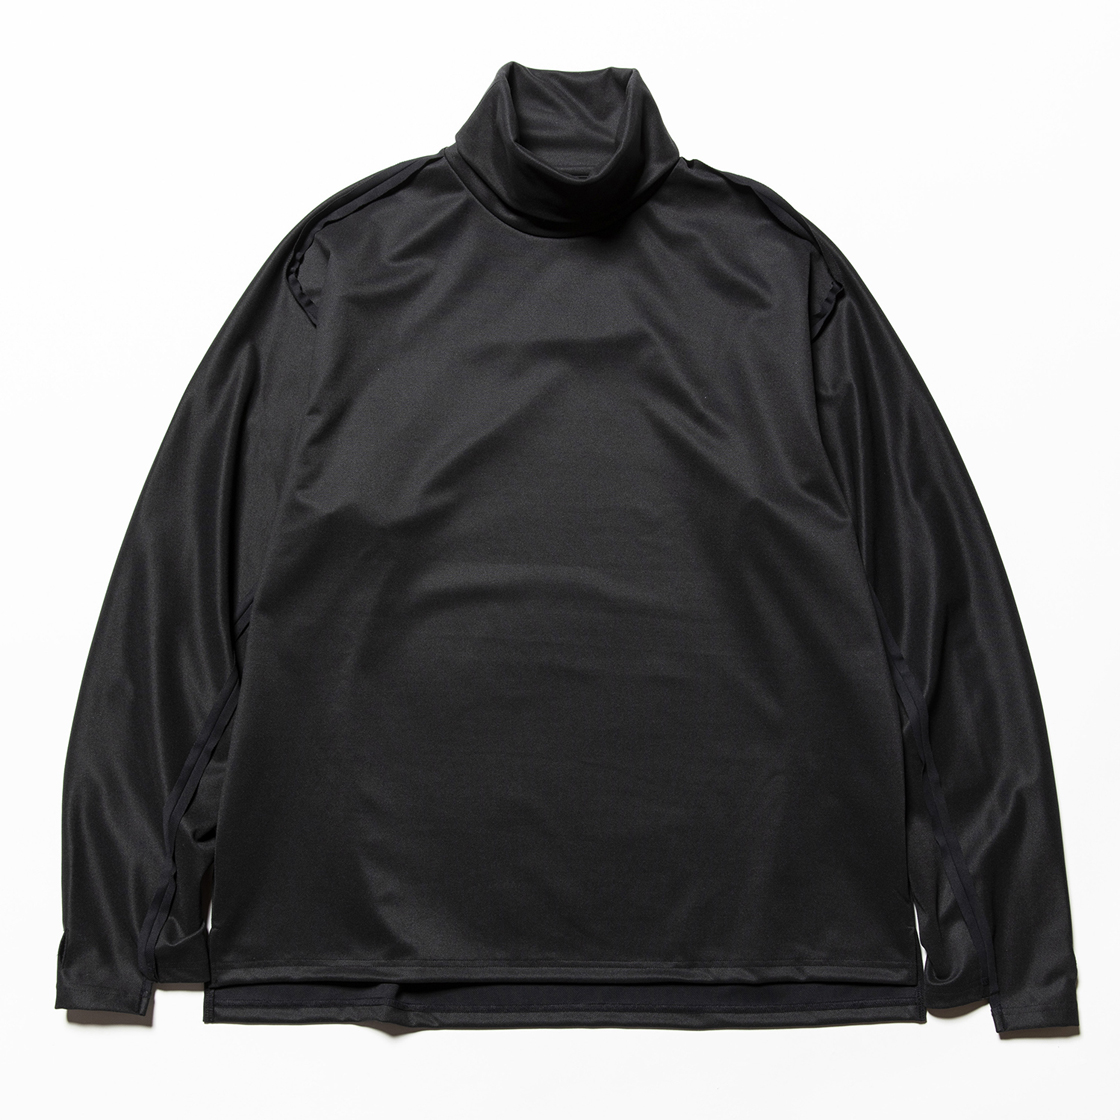 Twill Knit Turtleneck Off Black